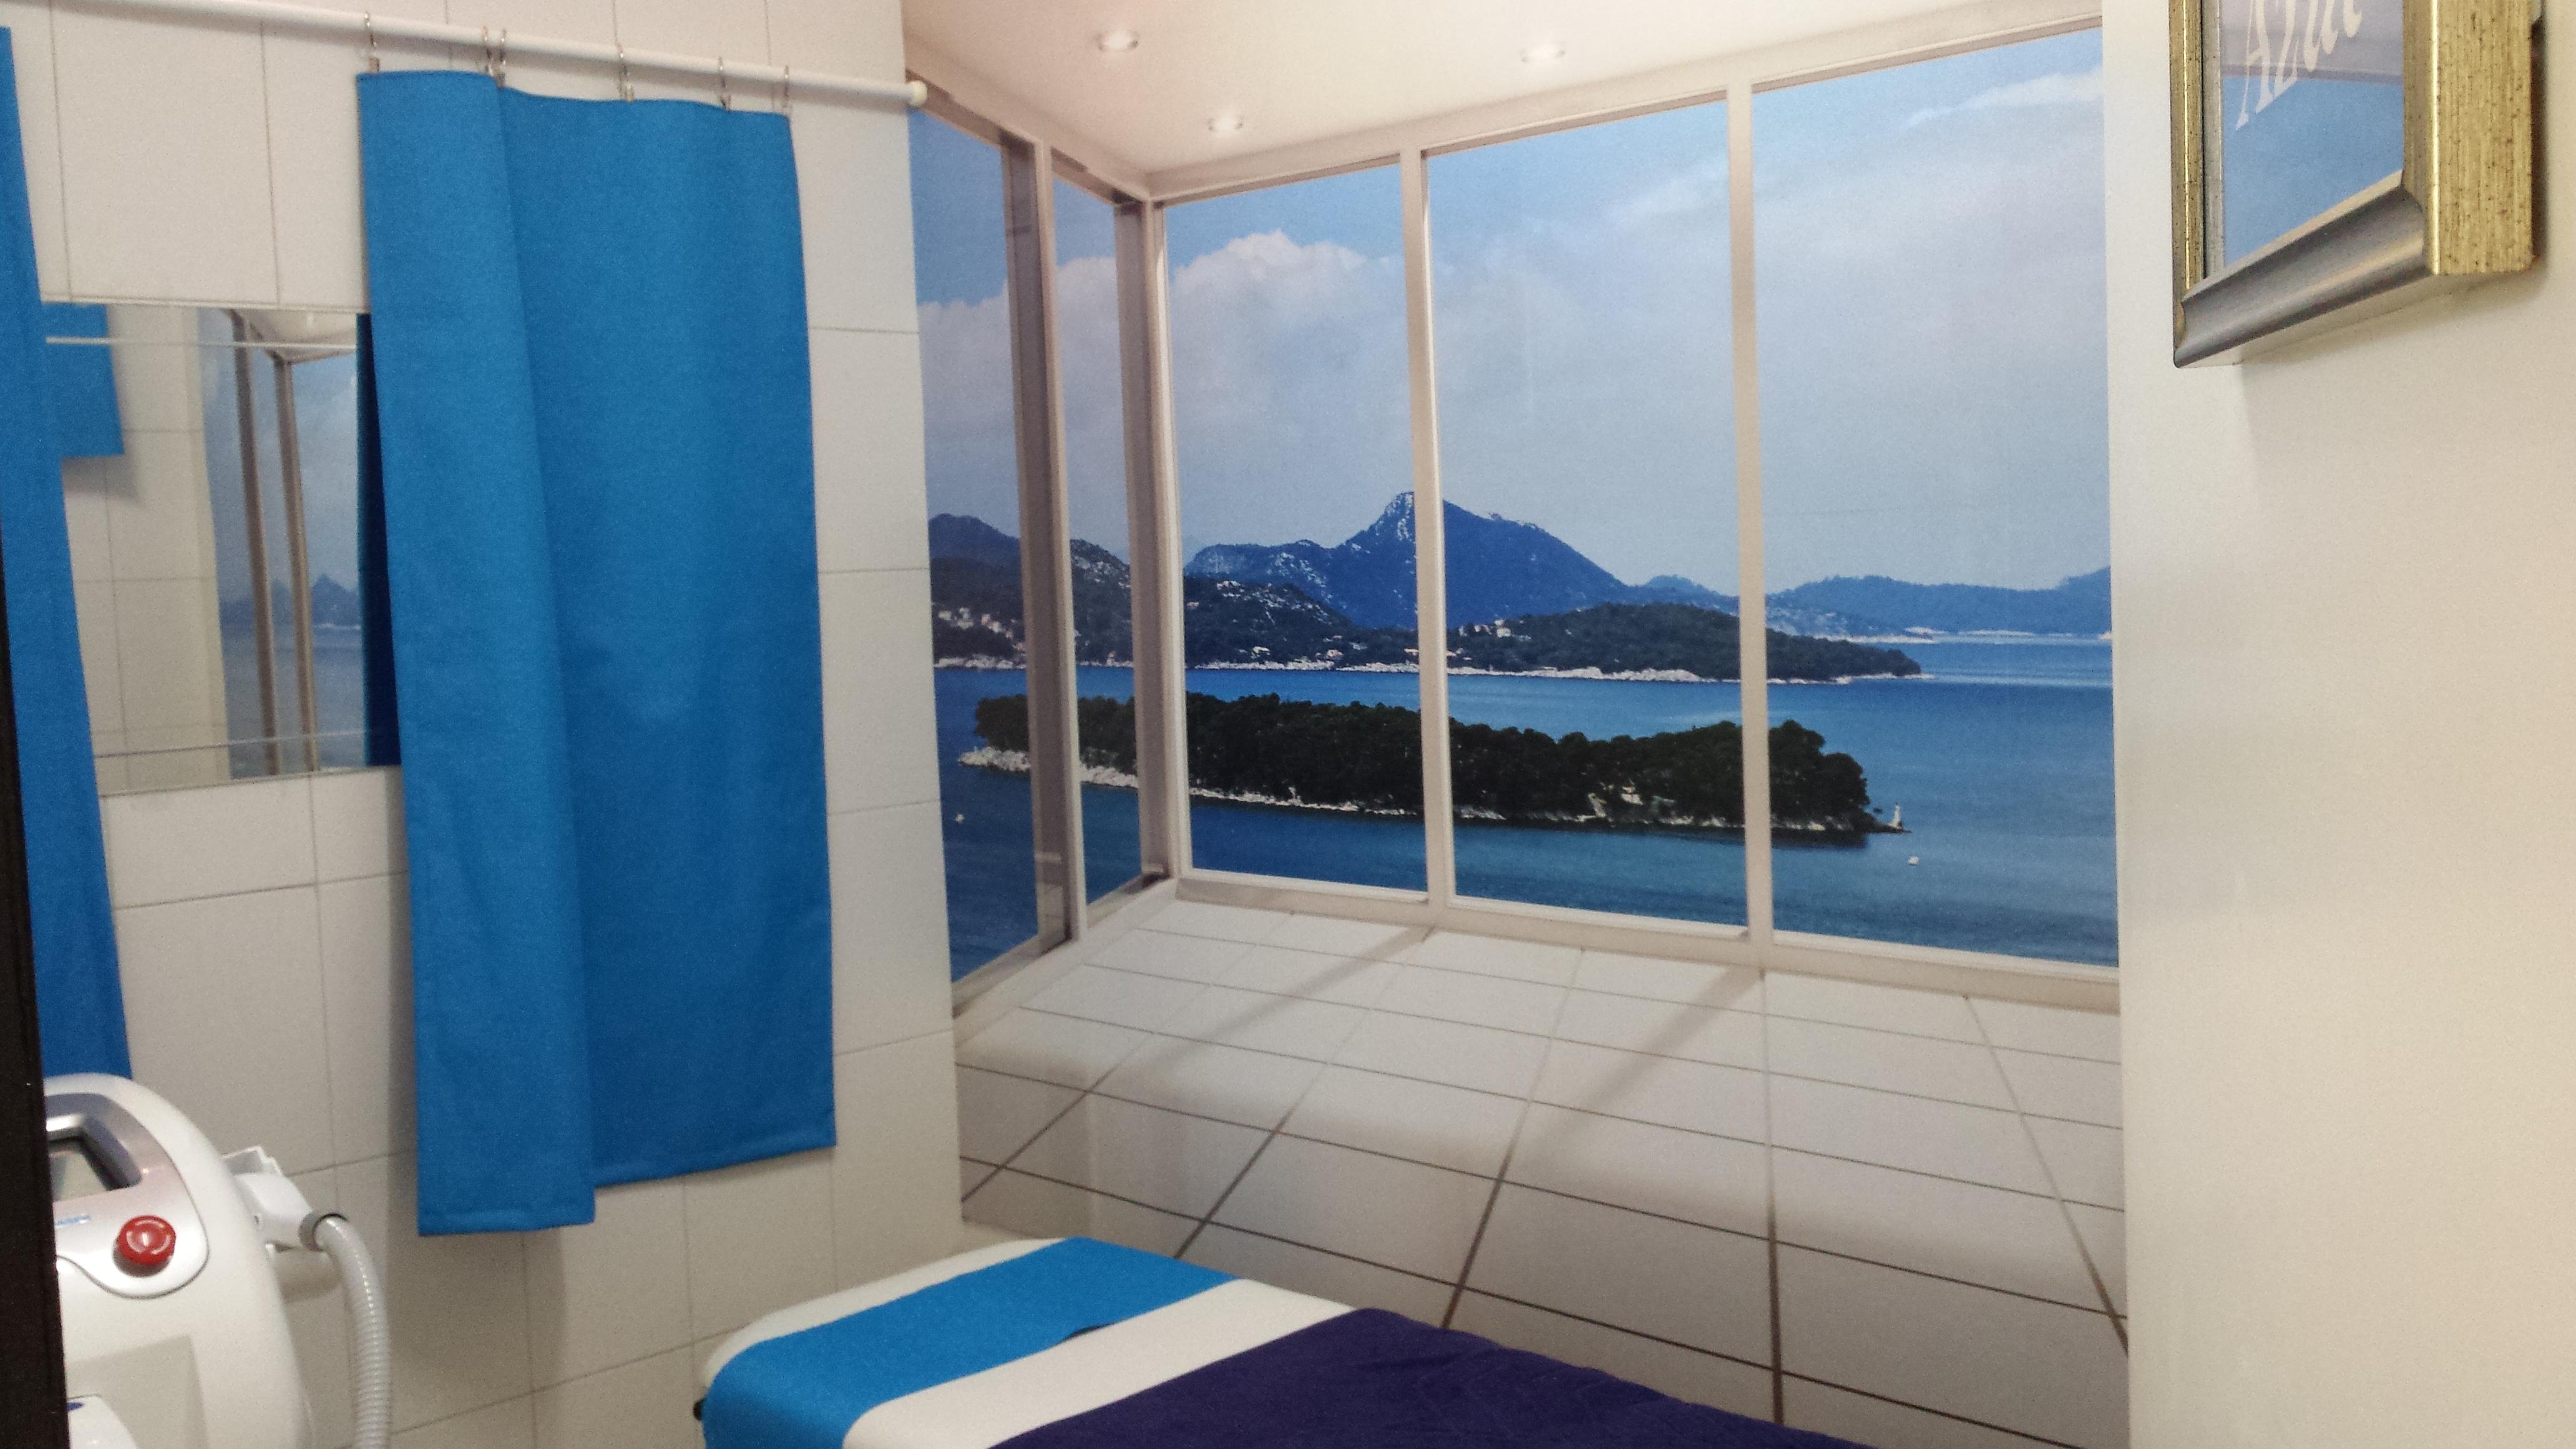 Sala azul (tratamientos  láser).